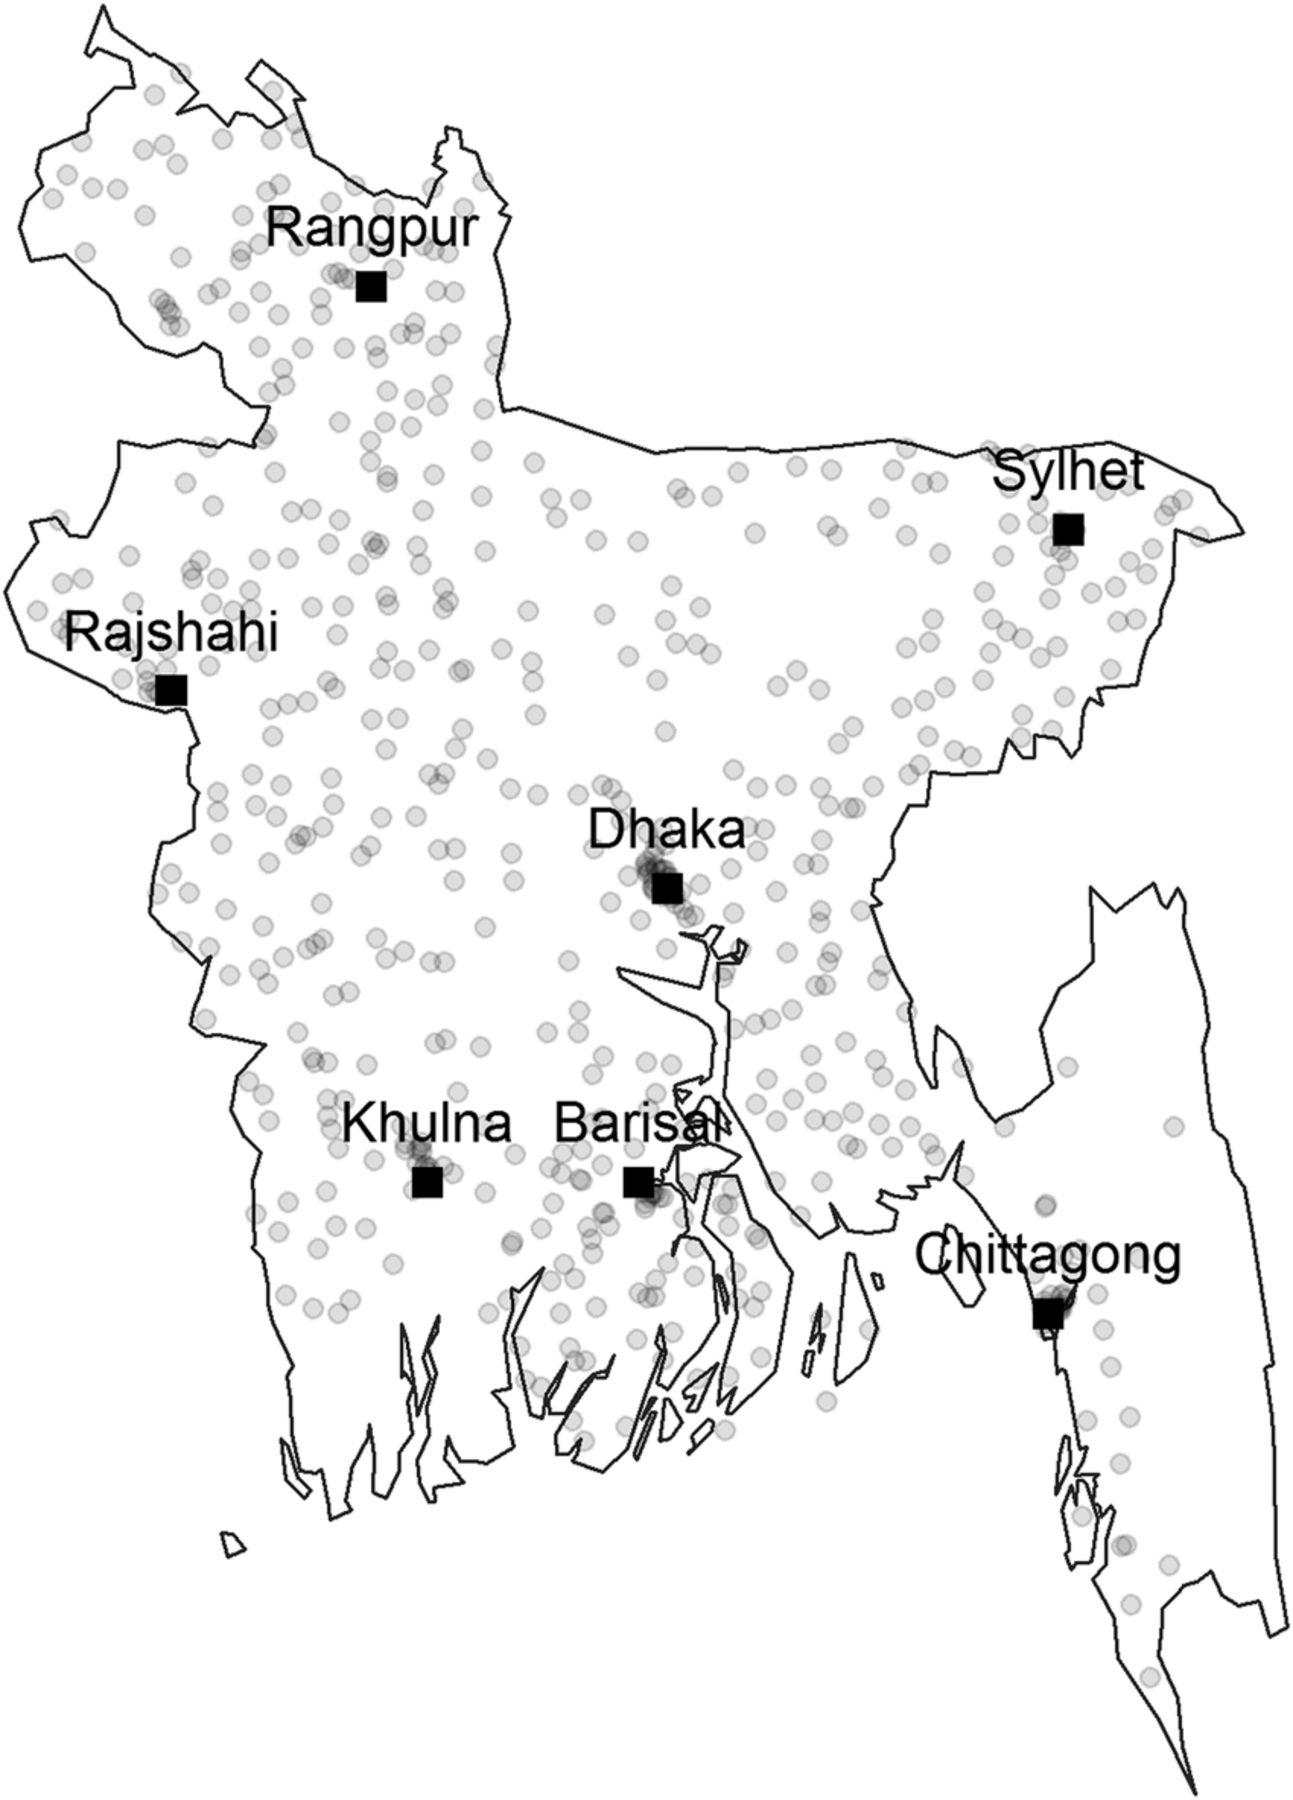 Determinants of childhood morbidity in Bangladesh